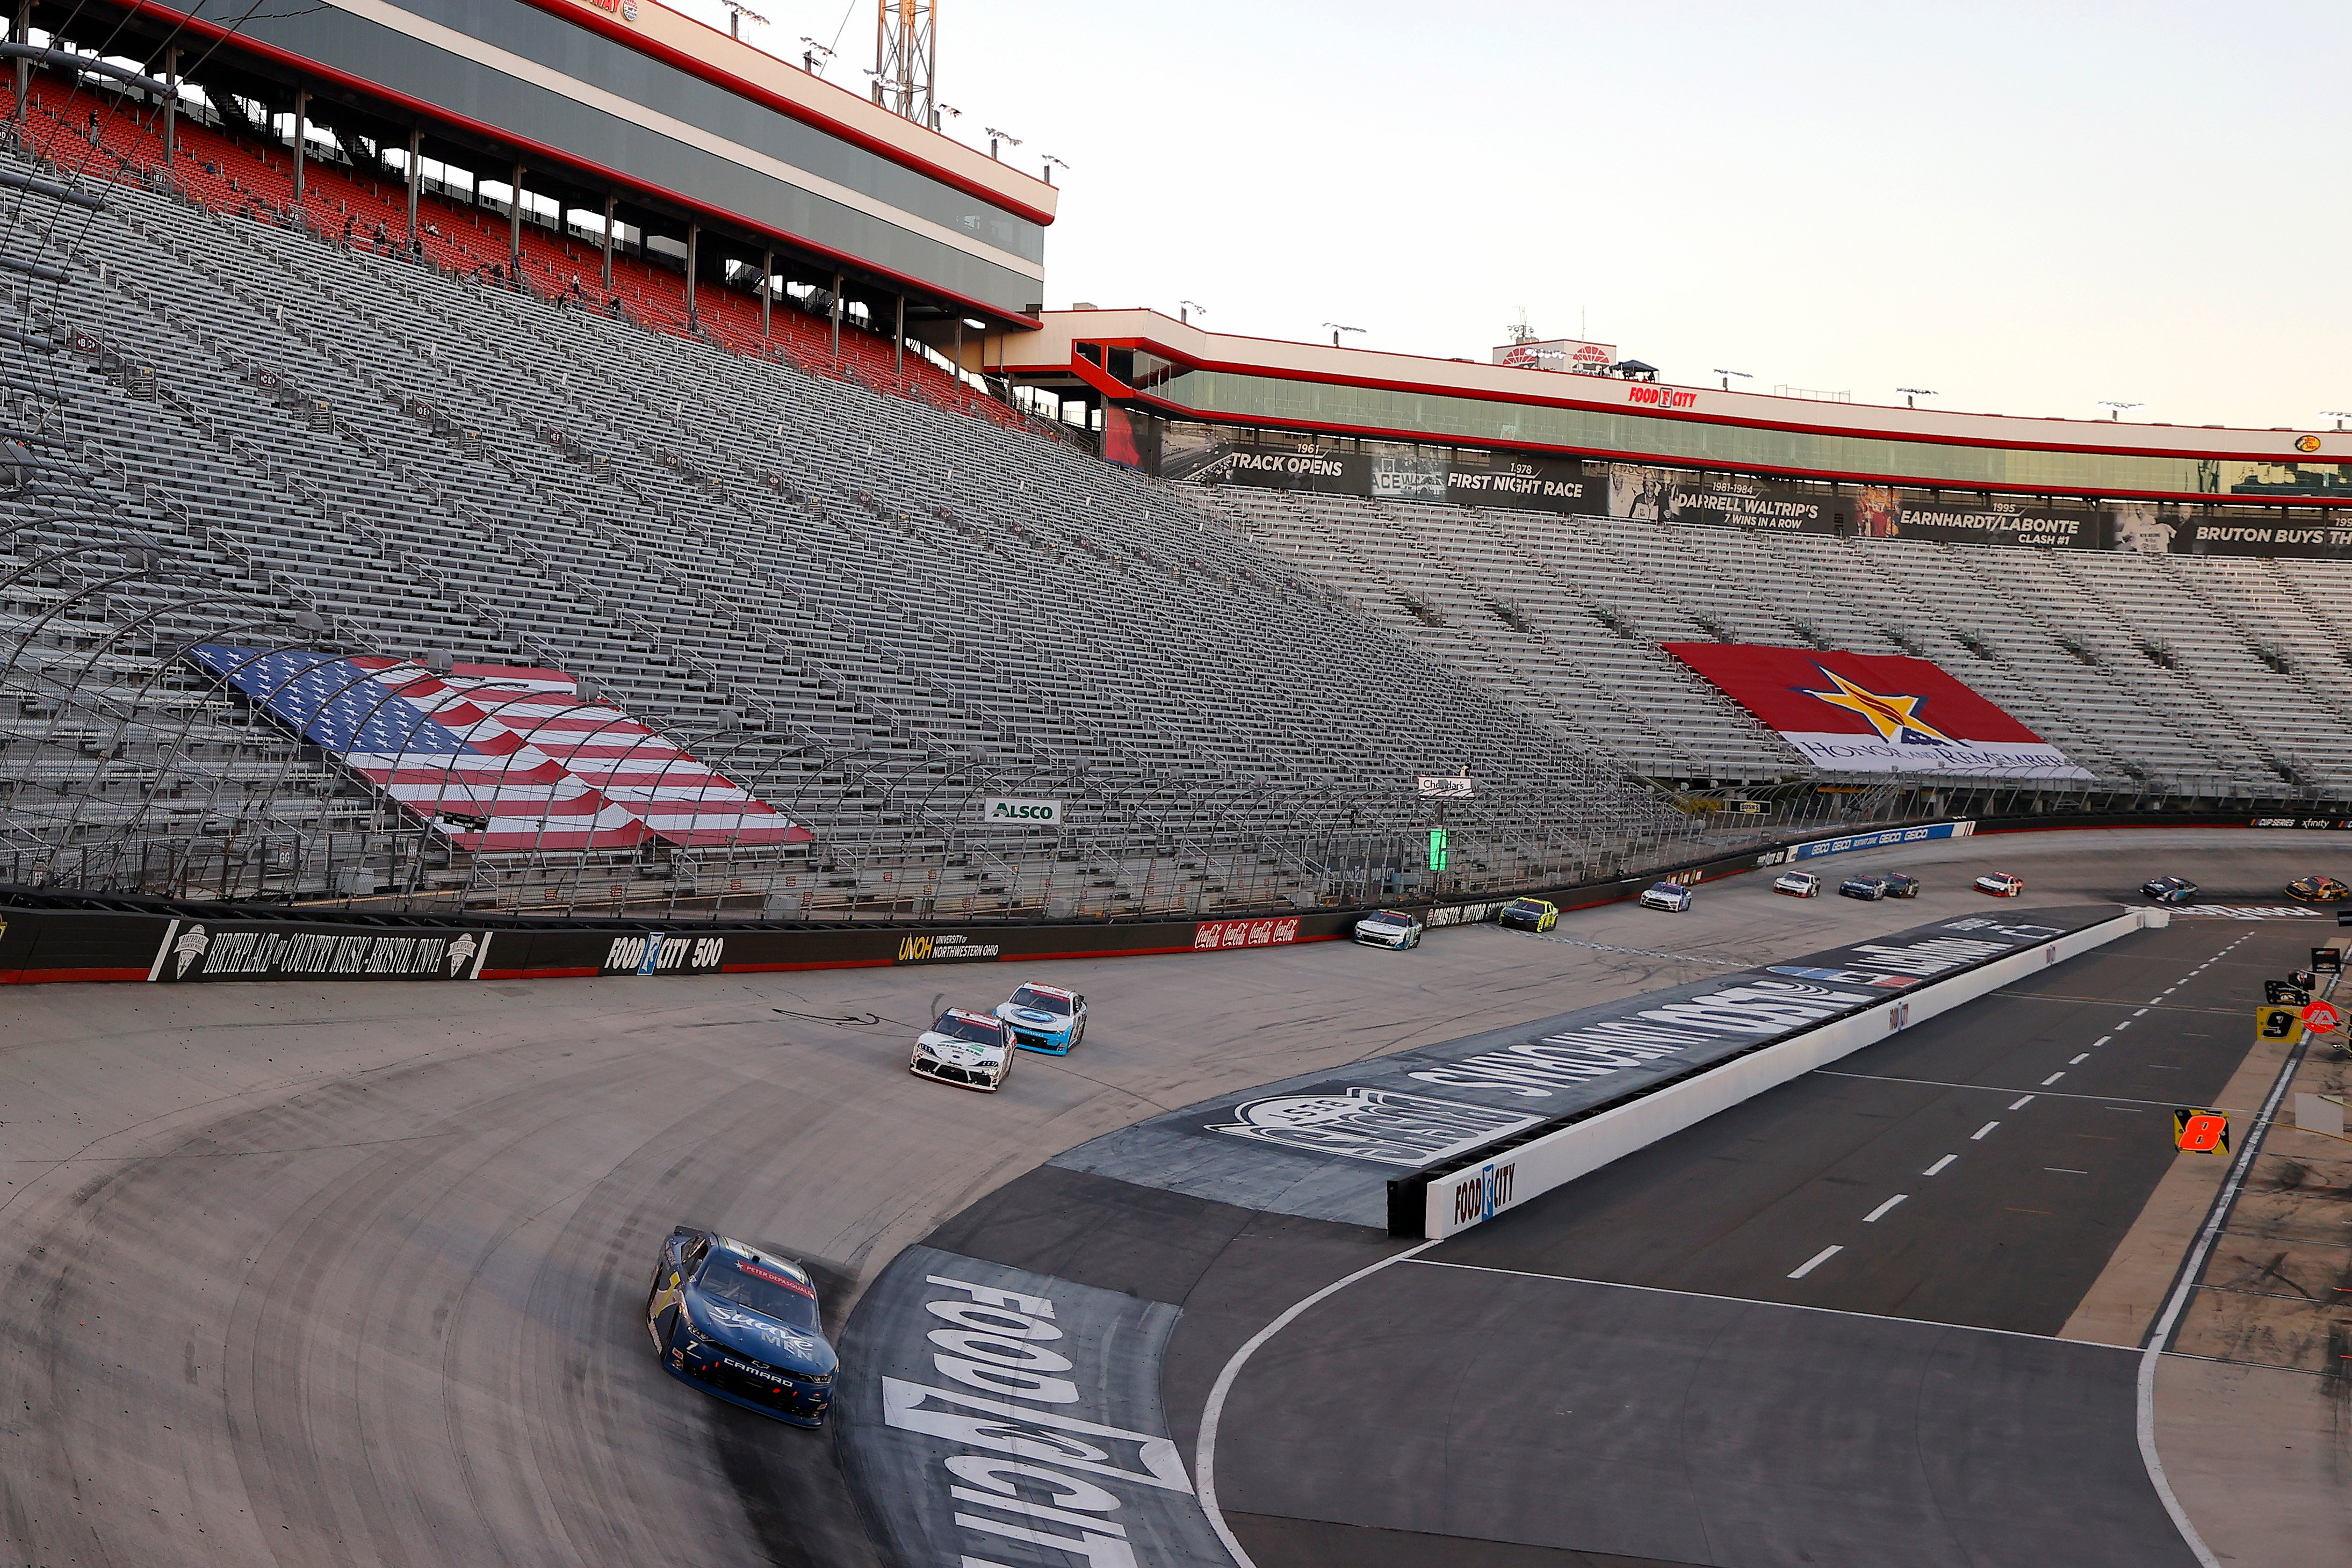 Santino Ferrucci eyeing NASCAR for 2021 - Racing News